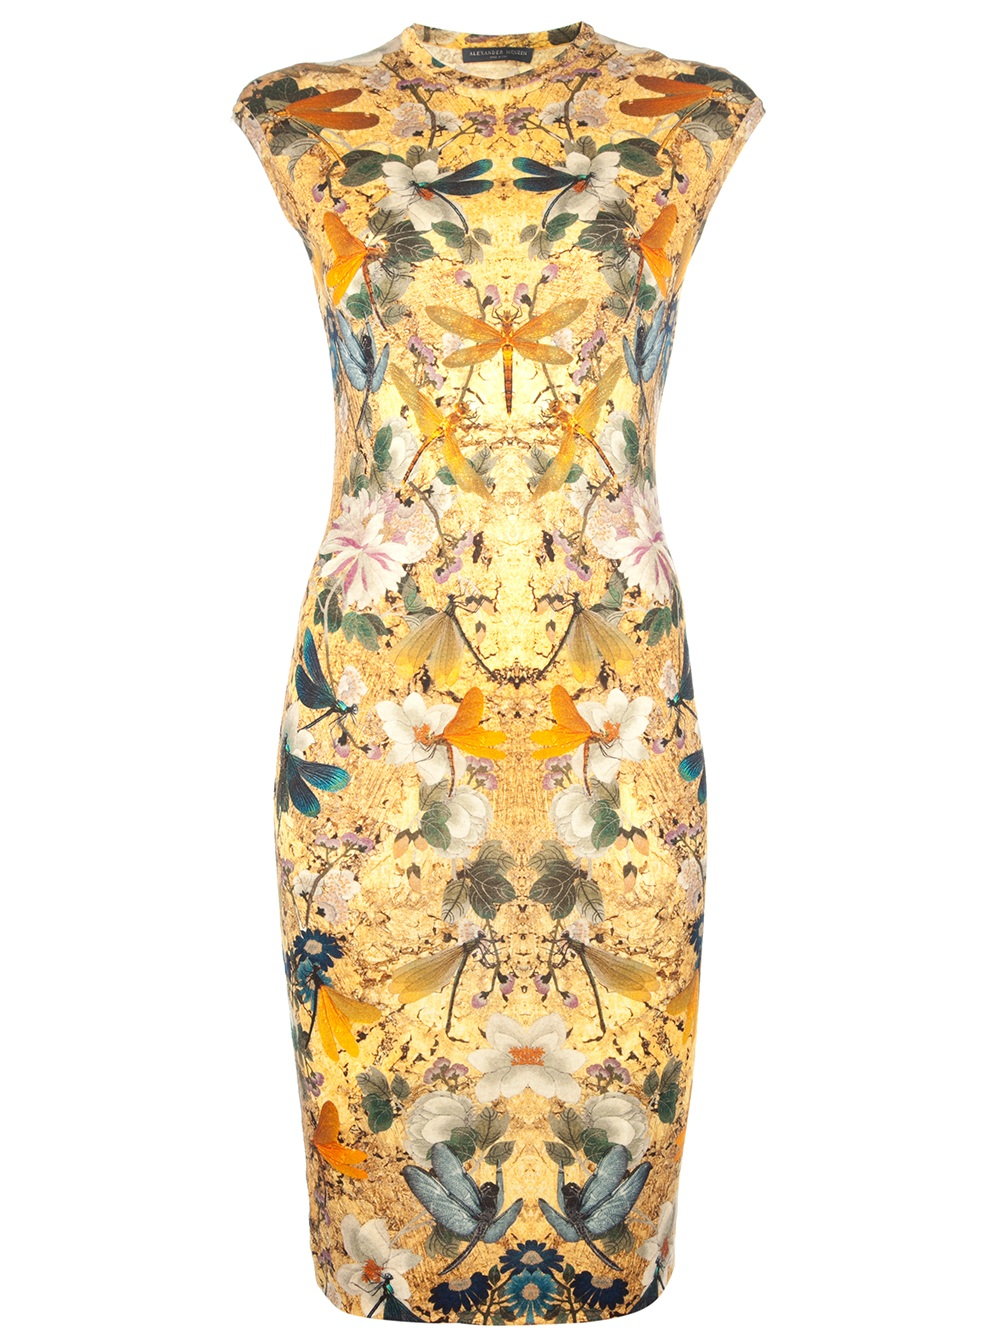 Alexander Mcqueen Multicoloured Print Dress In Floral